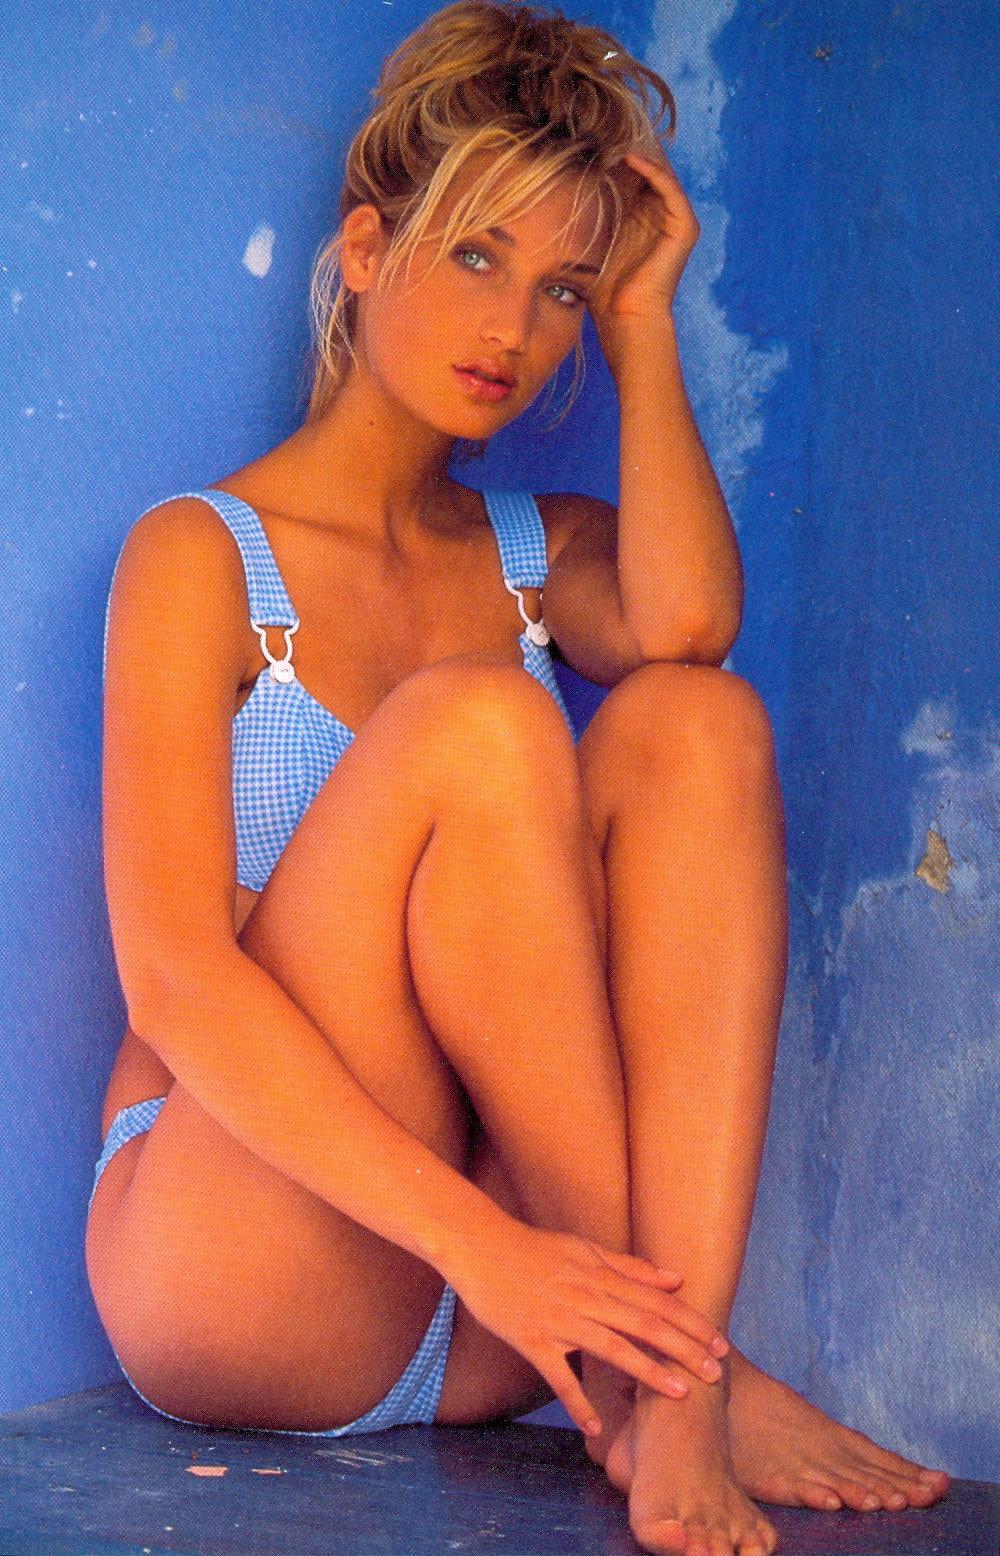 Manon von Gerkan GER nudes (27 photos) Paparazzi, iCloud, underwear